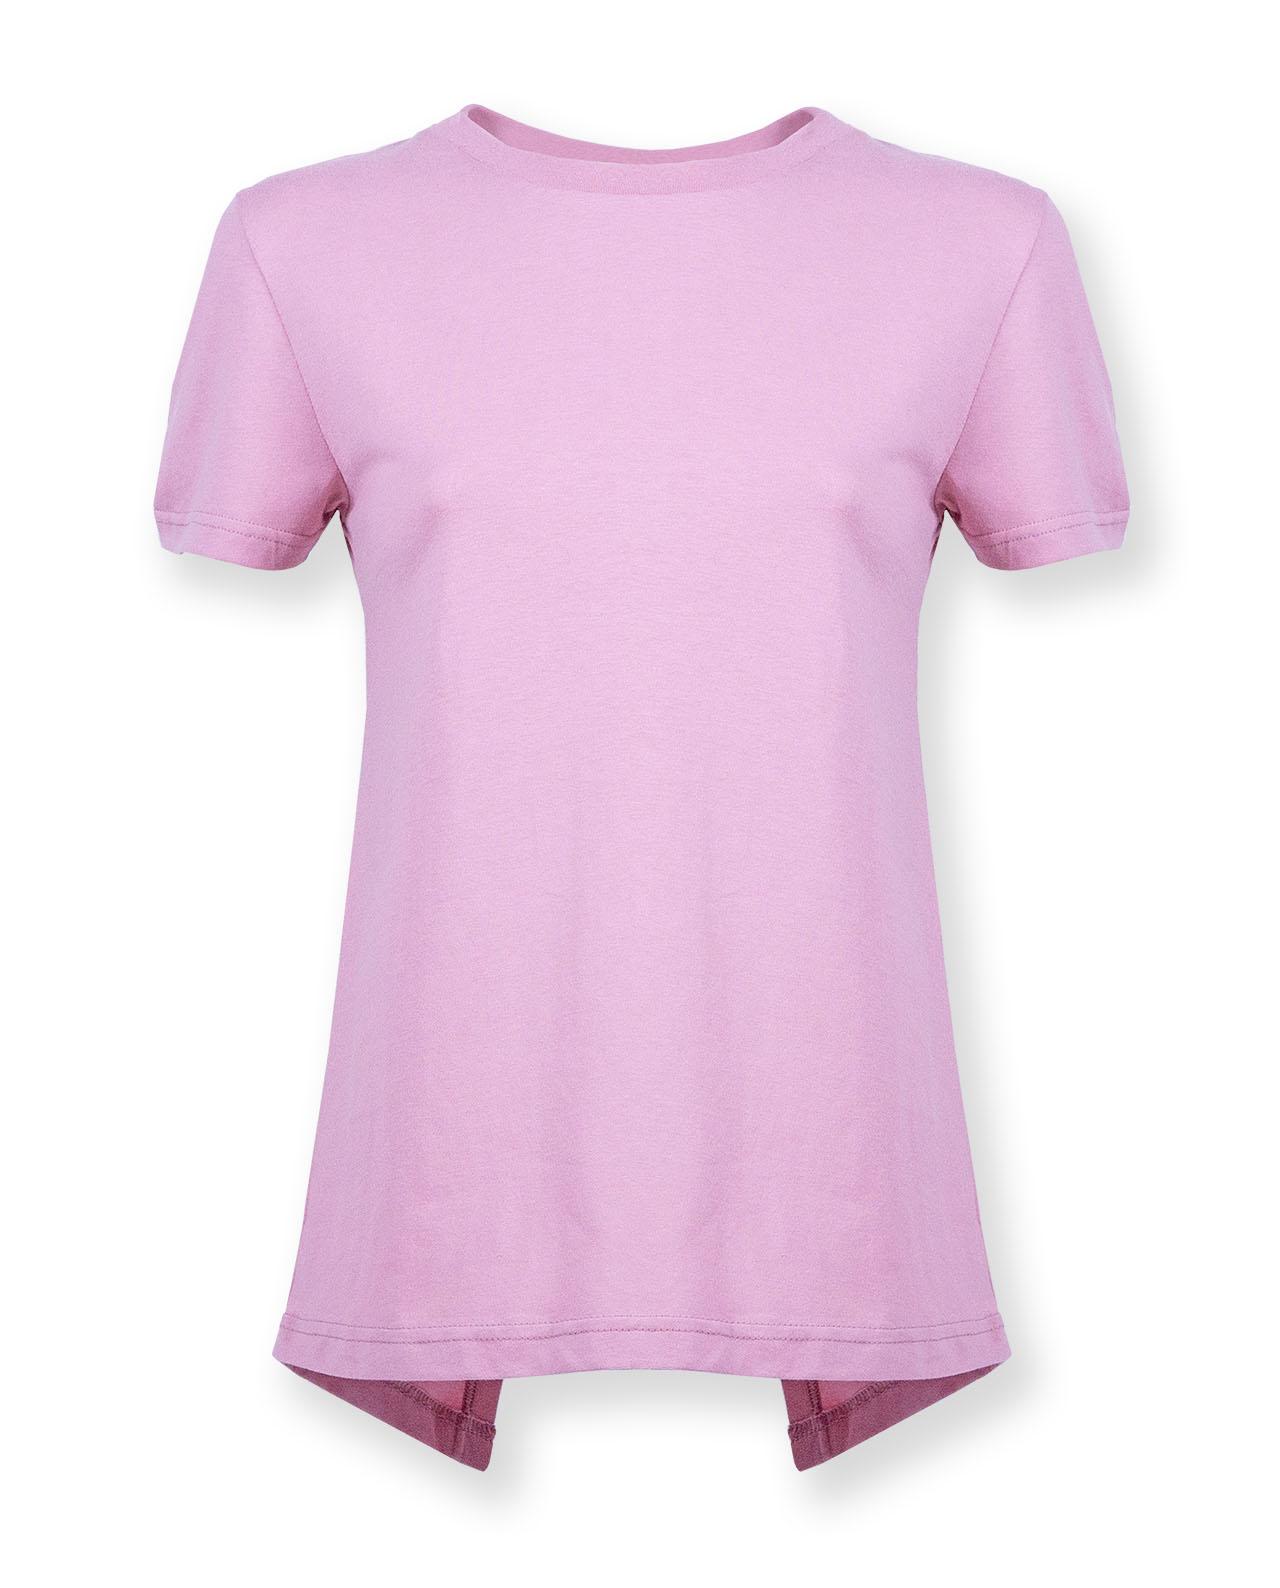 770ecf8712ab8a ... Vorschau  Damen Shirt mit Rückenschlitz Degree Clothing altrosa ...